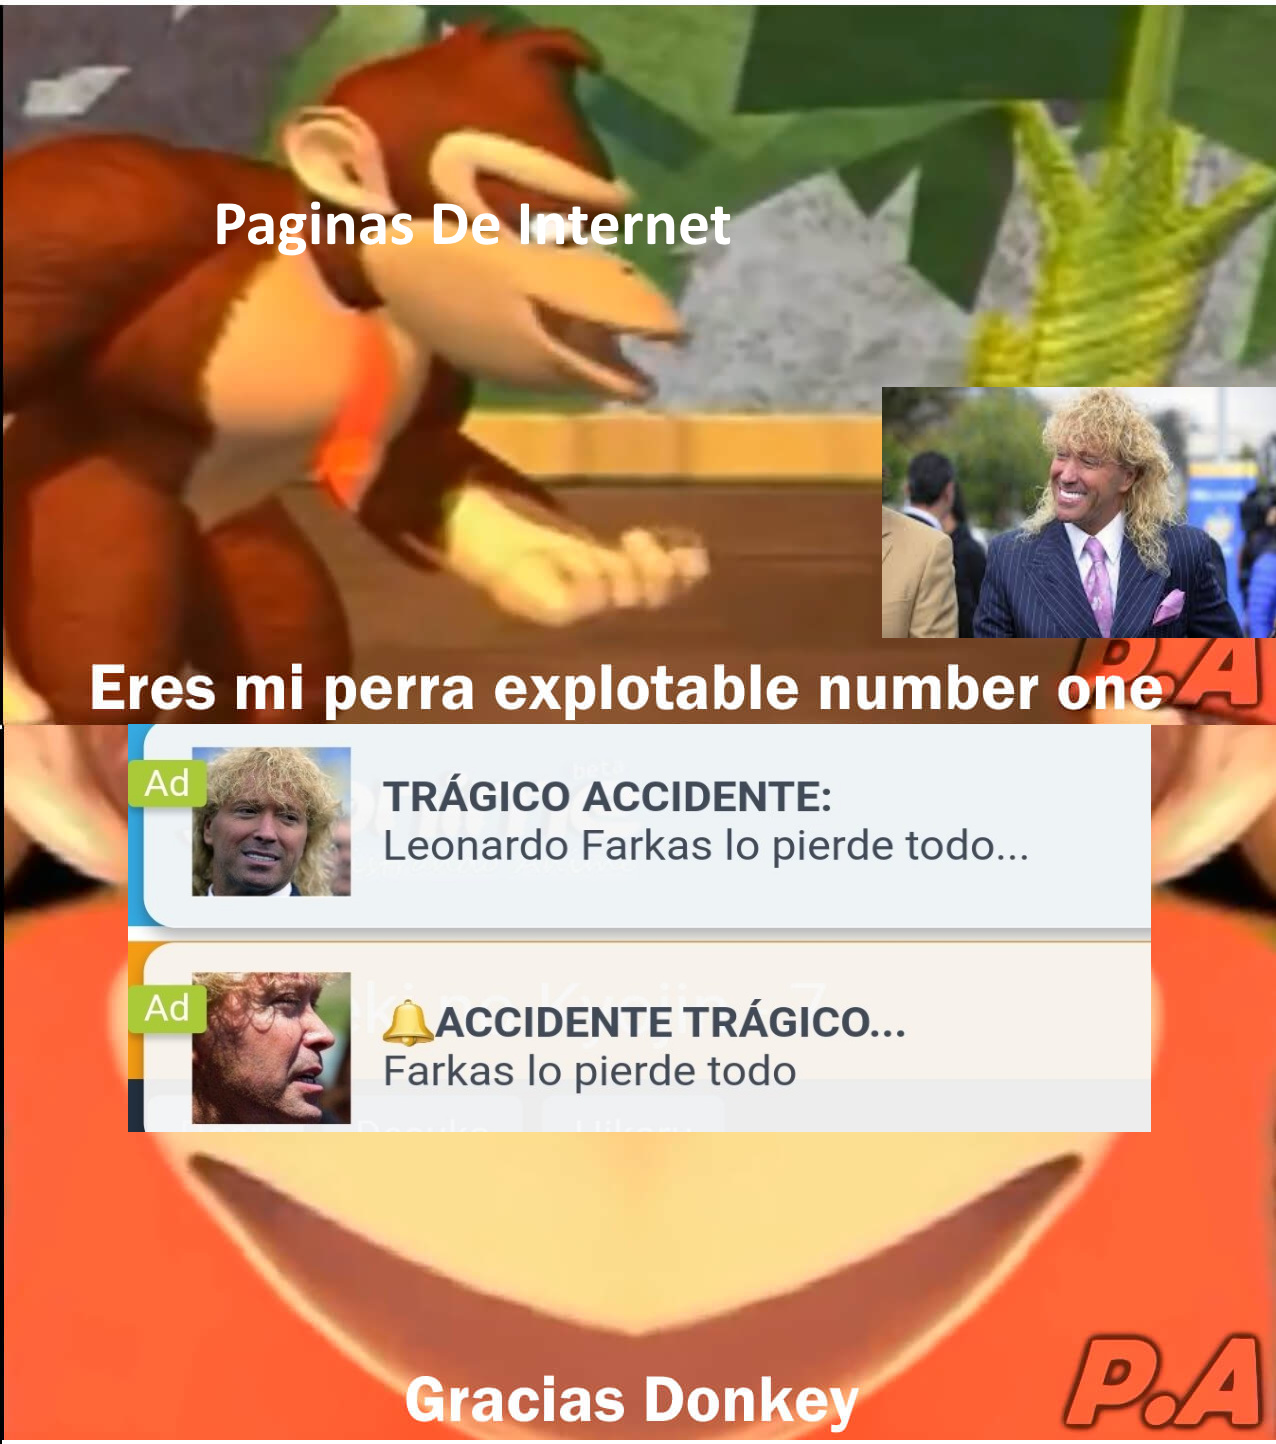 plantilla explotada number one pero aun sirve - meme